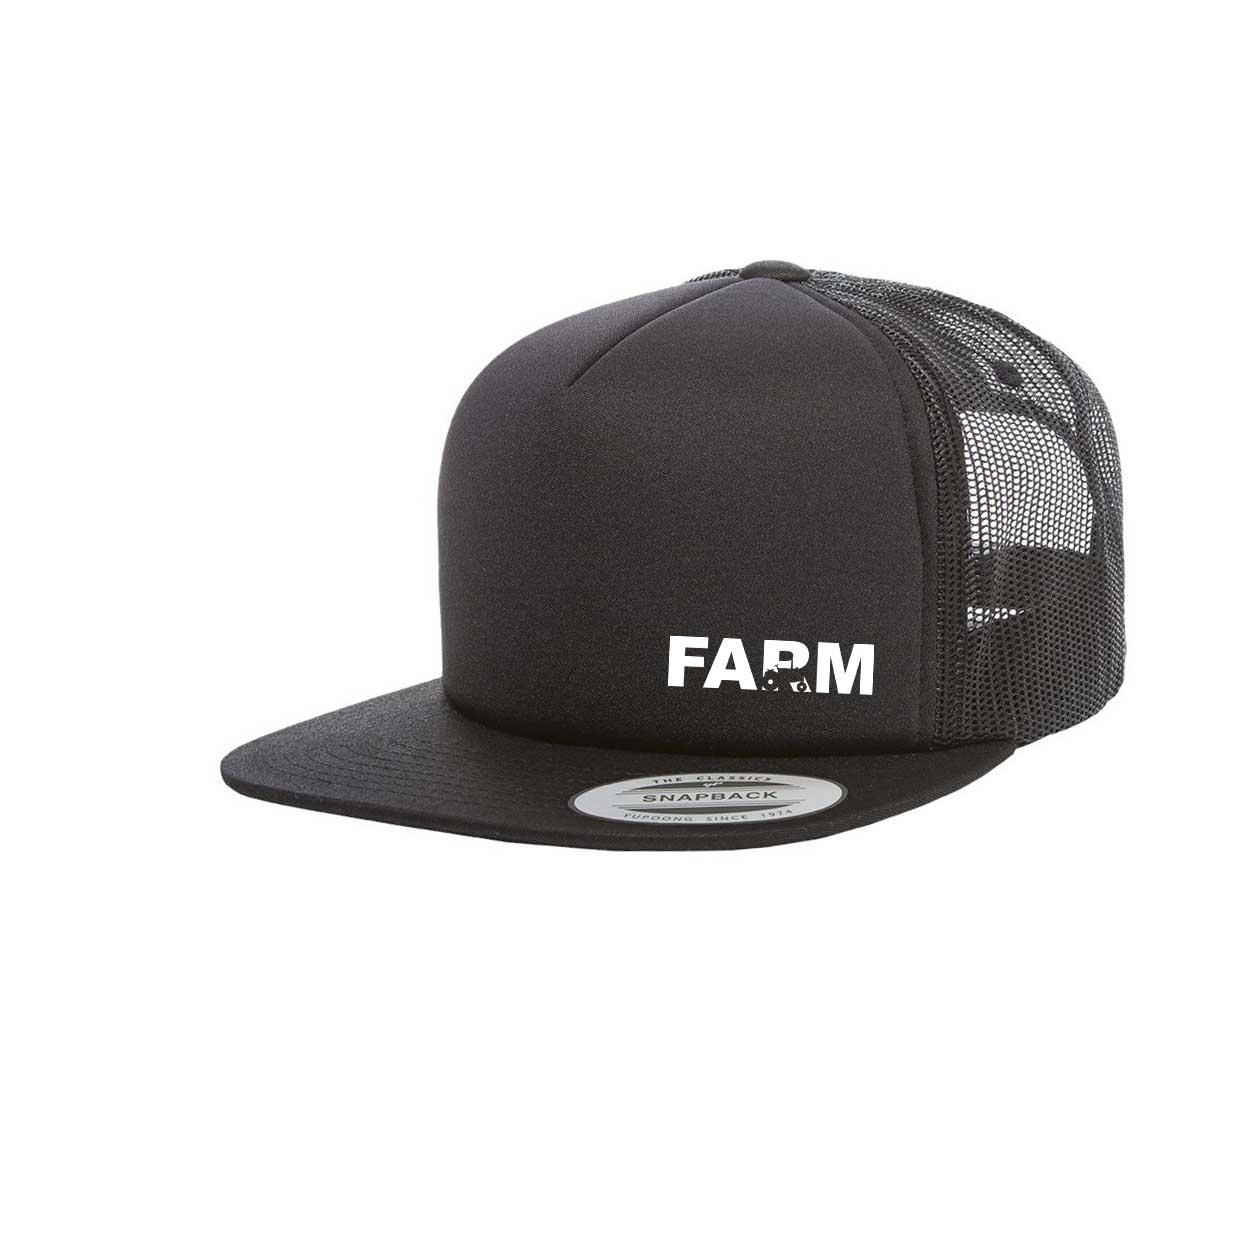 Farm Tractor Logo Night Out Premium Foam Flat Brim Snapback Hat Black (White Logo)